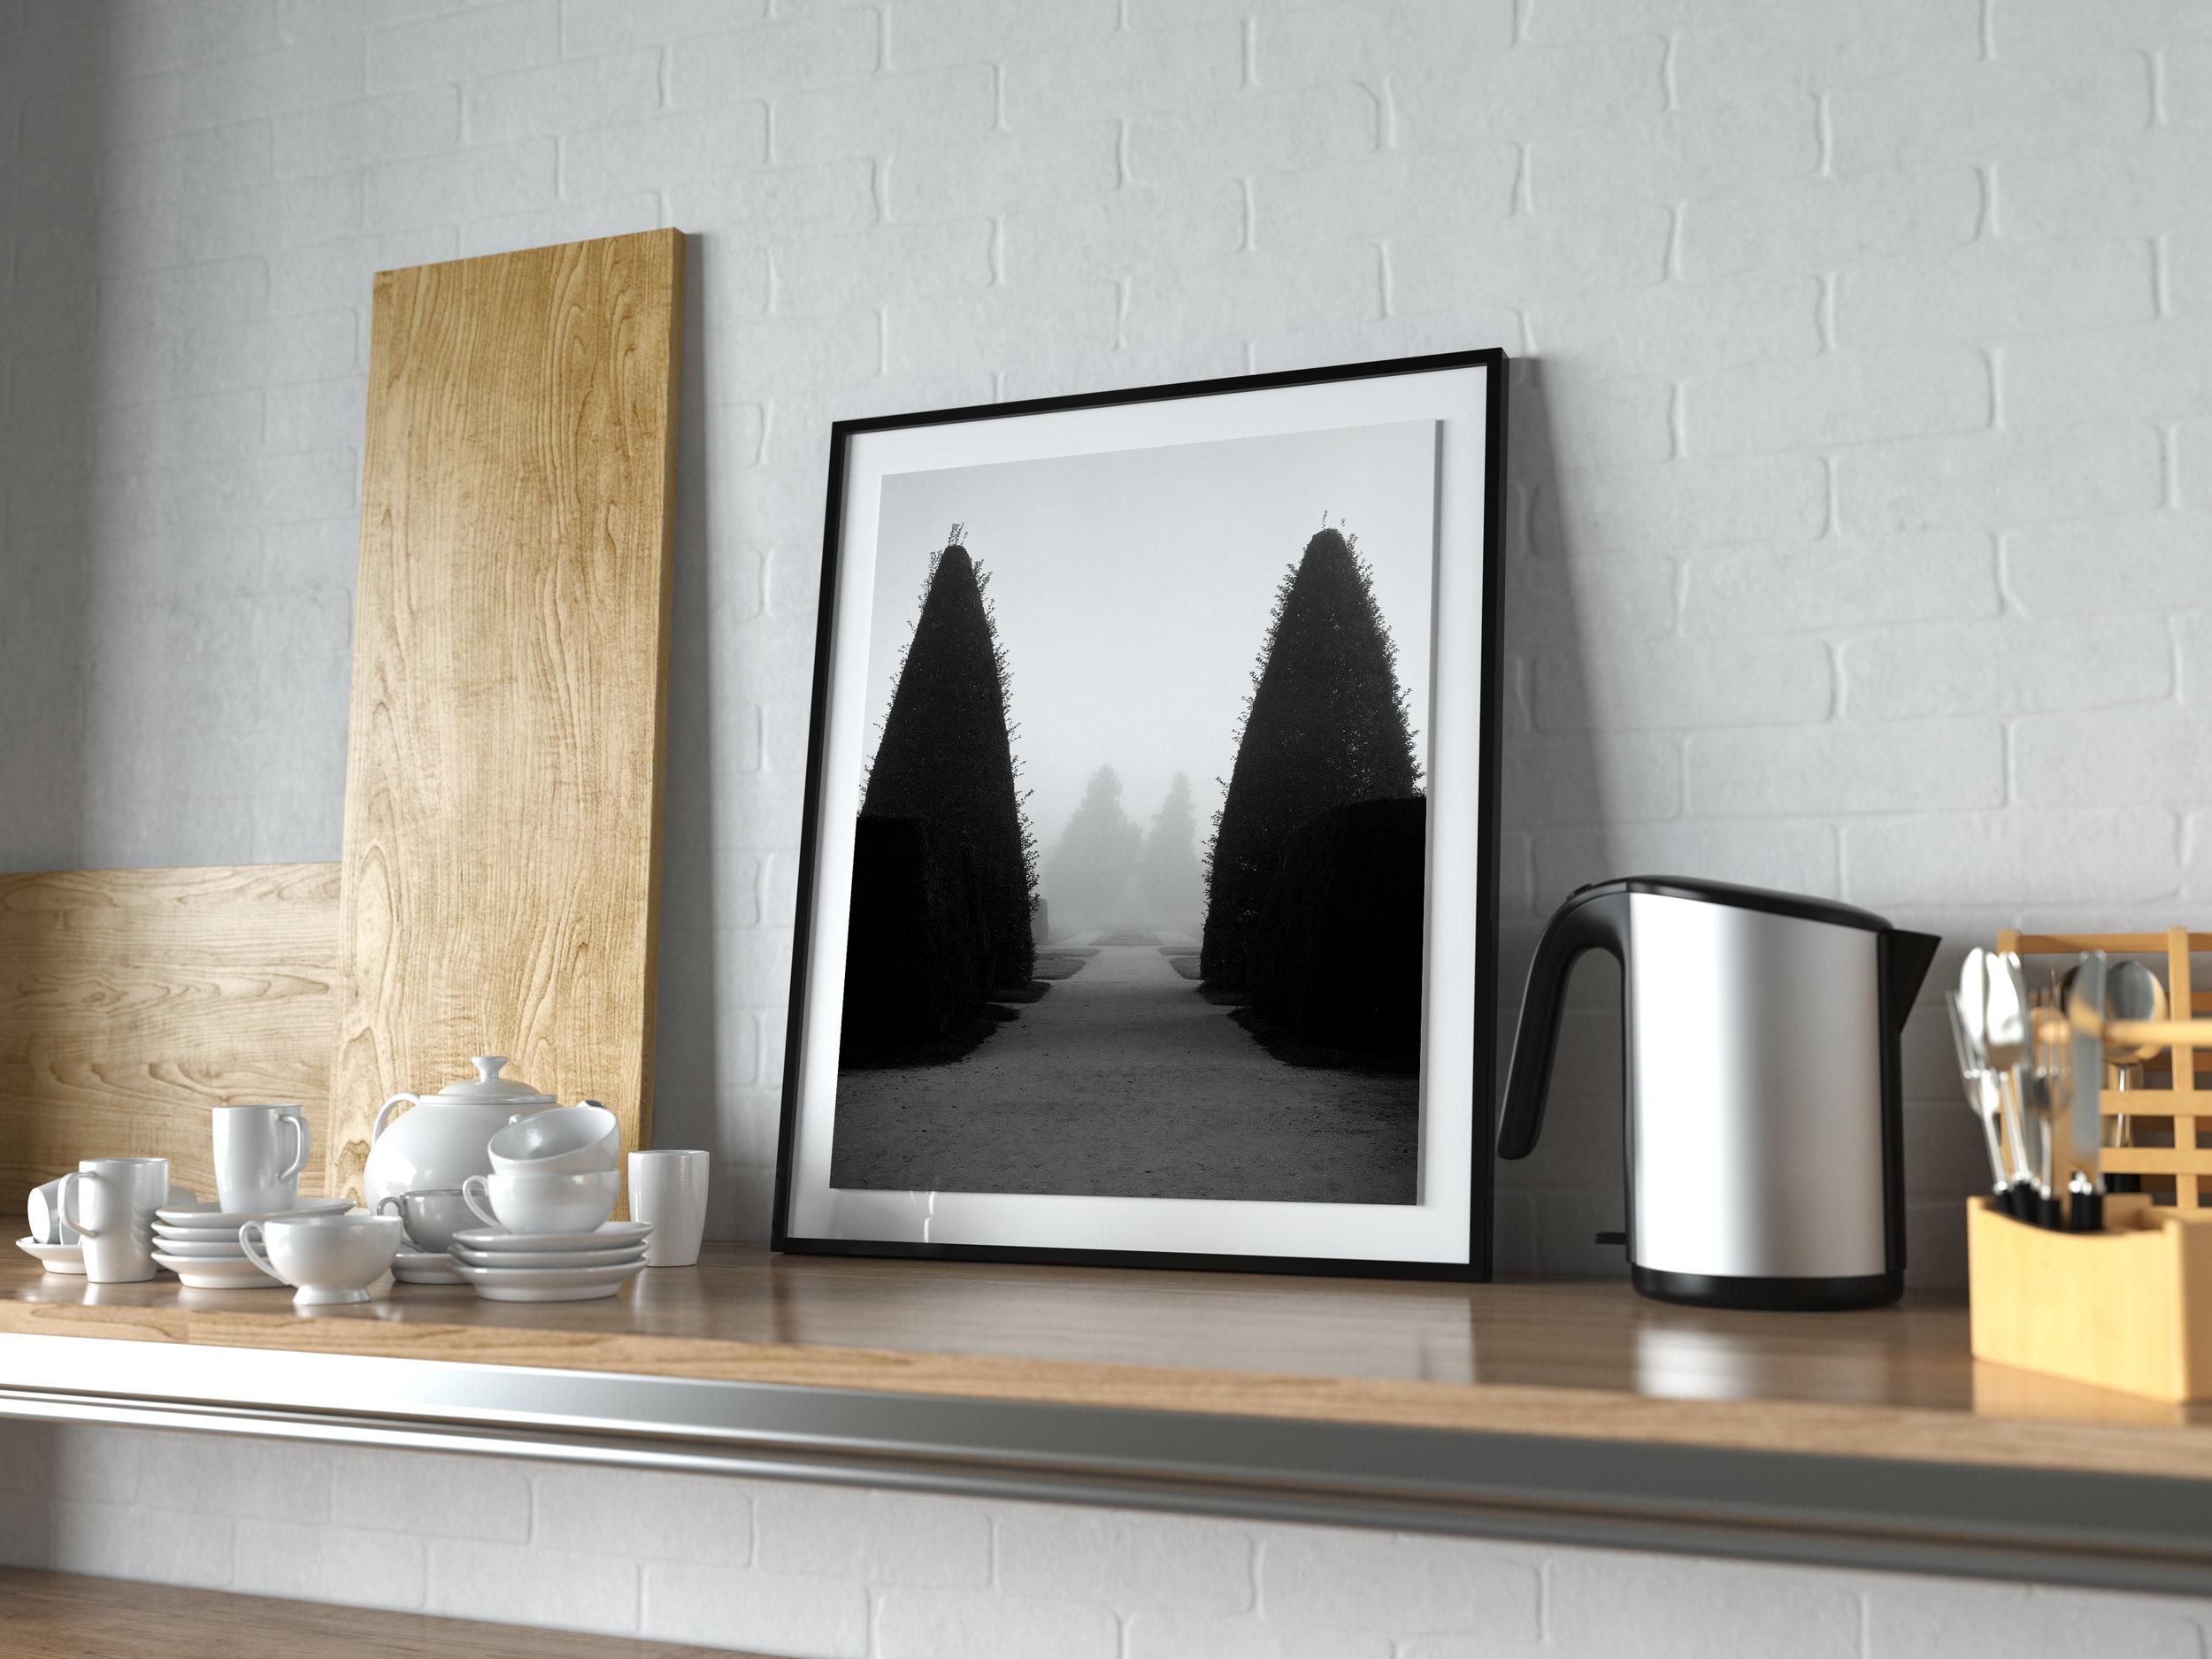 Mockup kitchen trees.jpg